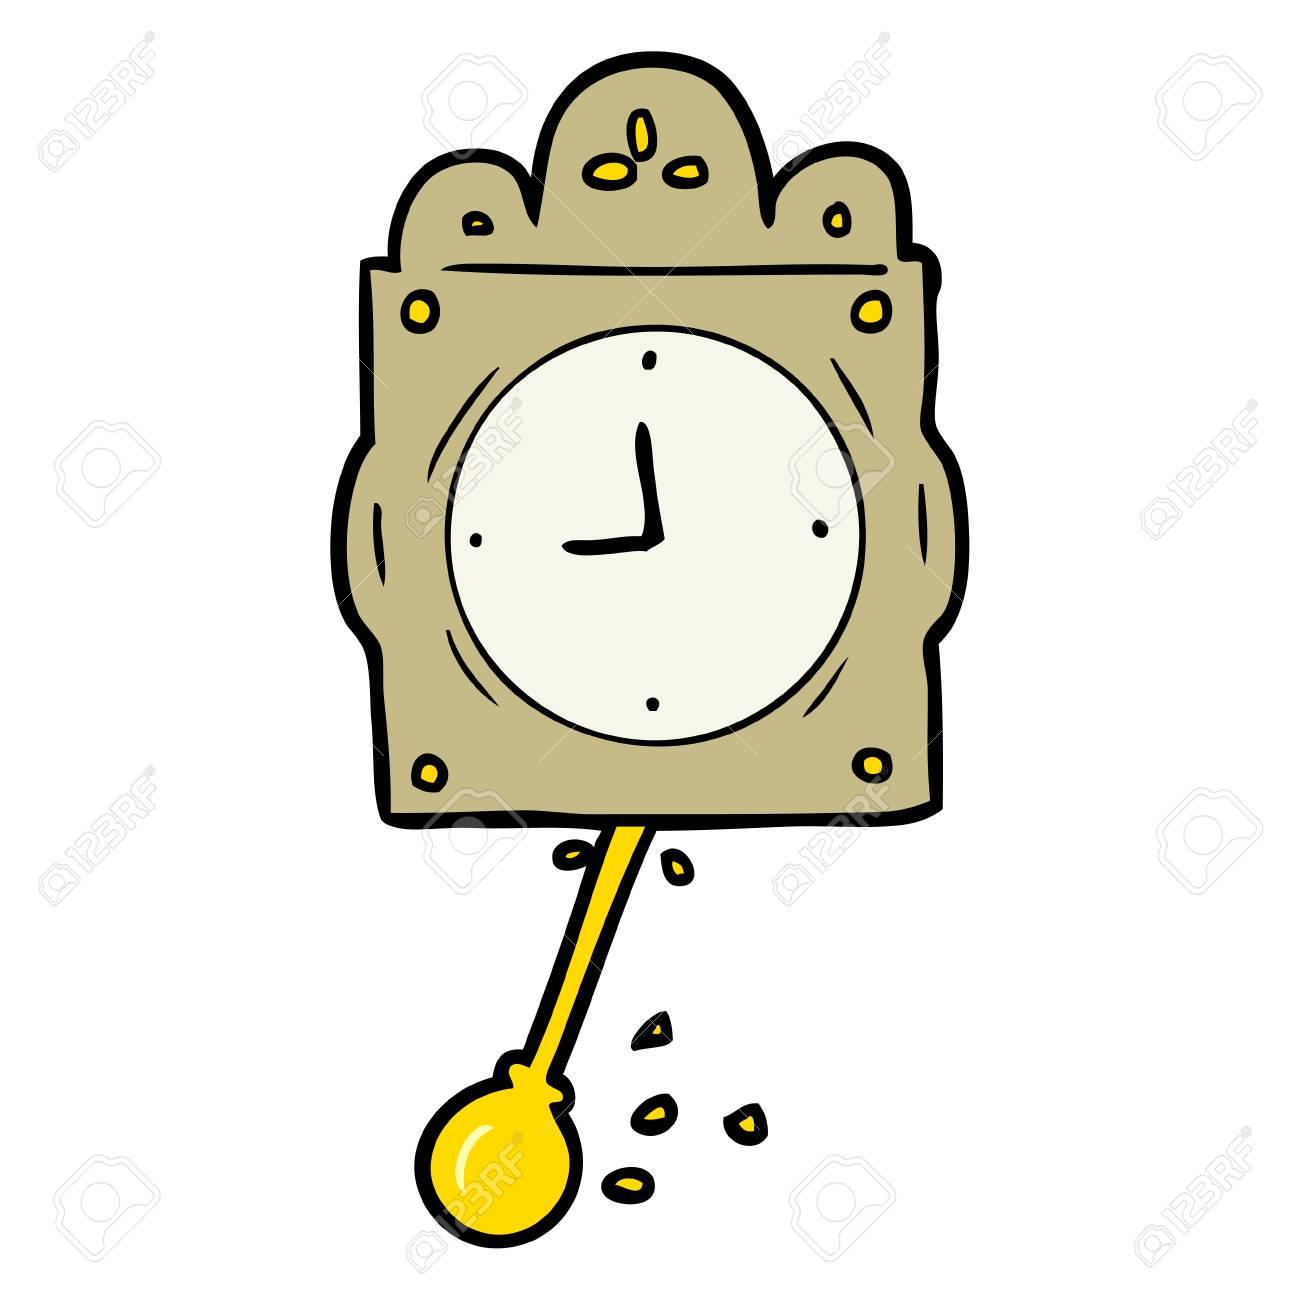 Cartoon Ticking Clock With Pendulum Royalty Free Cliparts Vectors